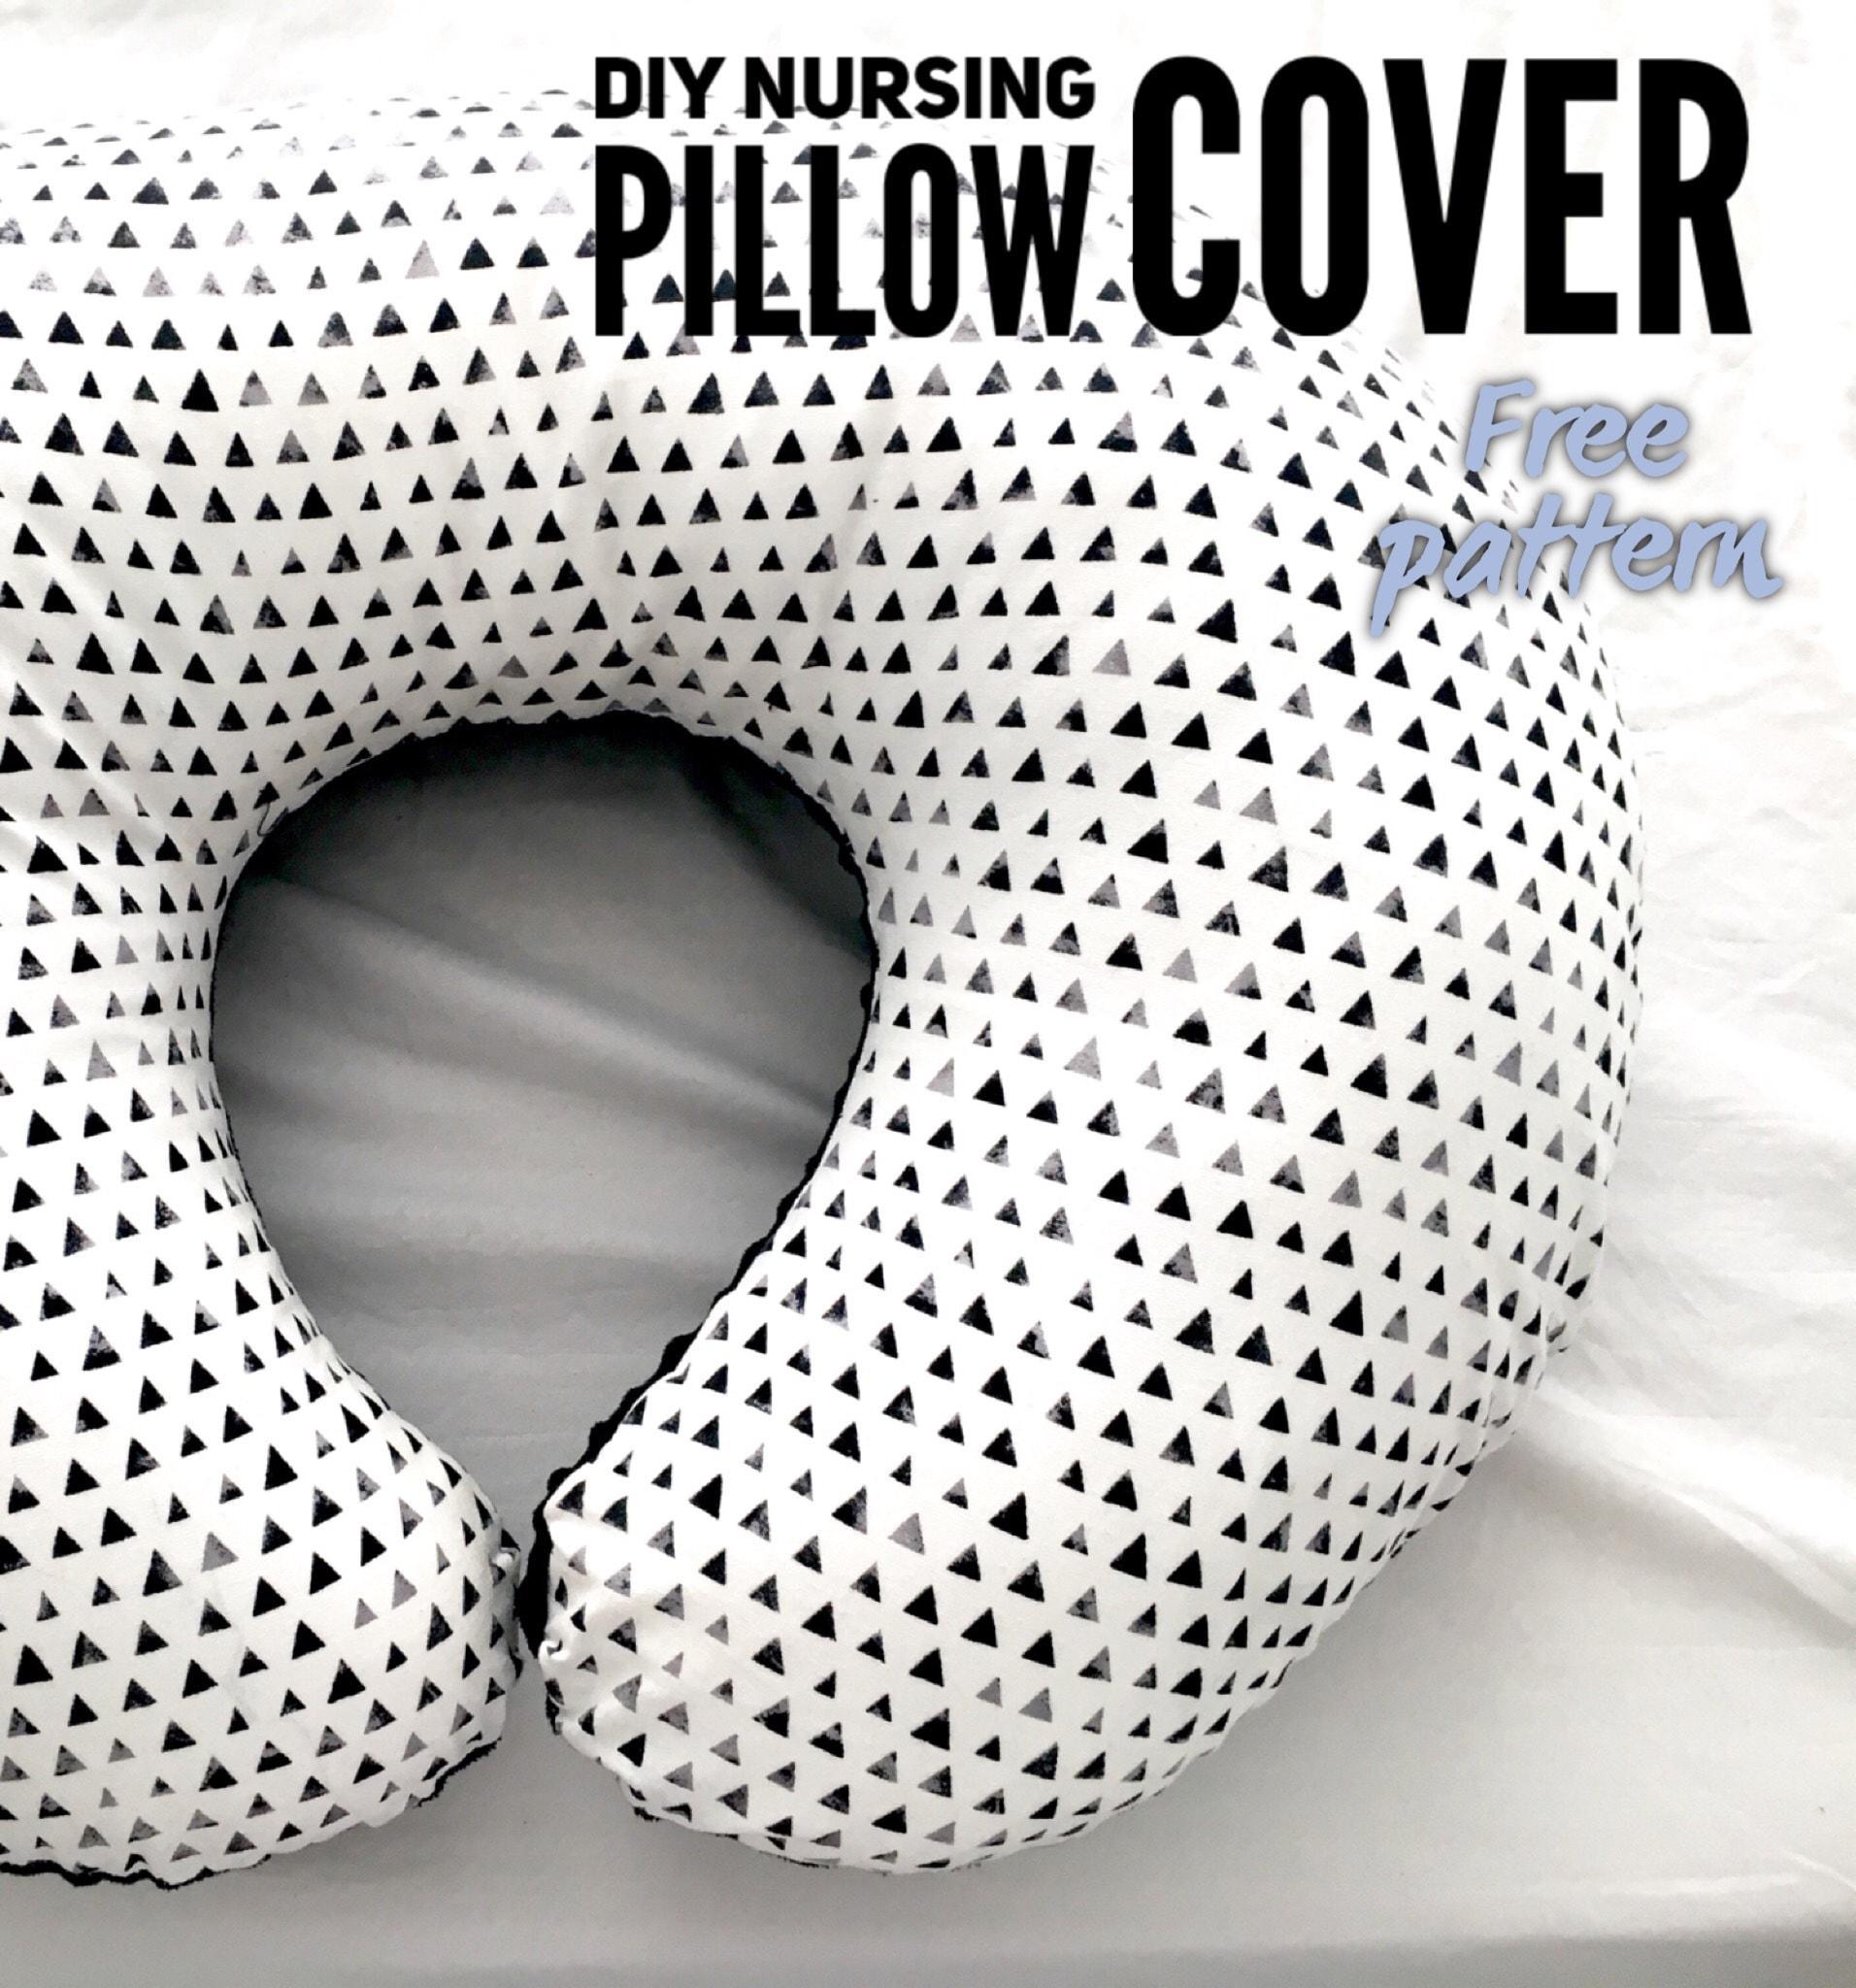 nursing-pillow-cover-life-on-waller